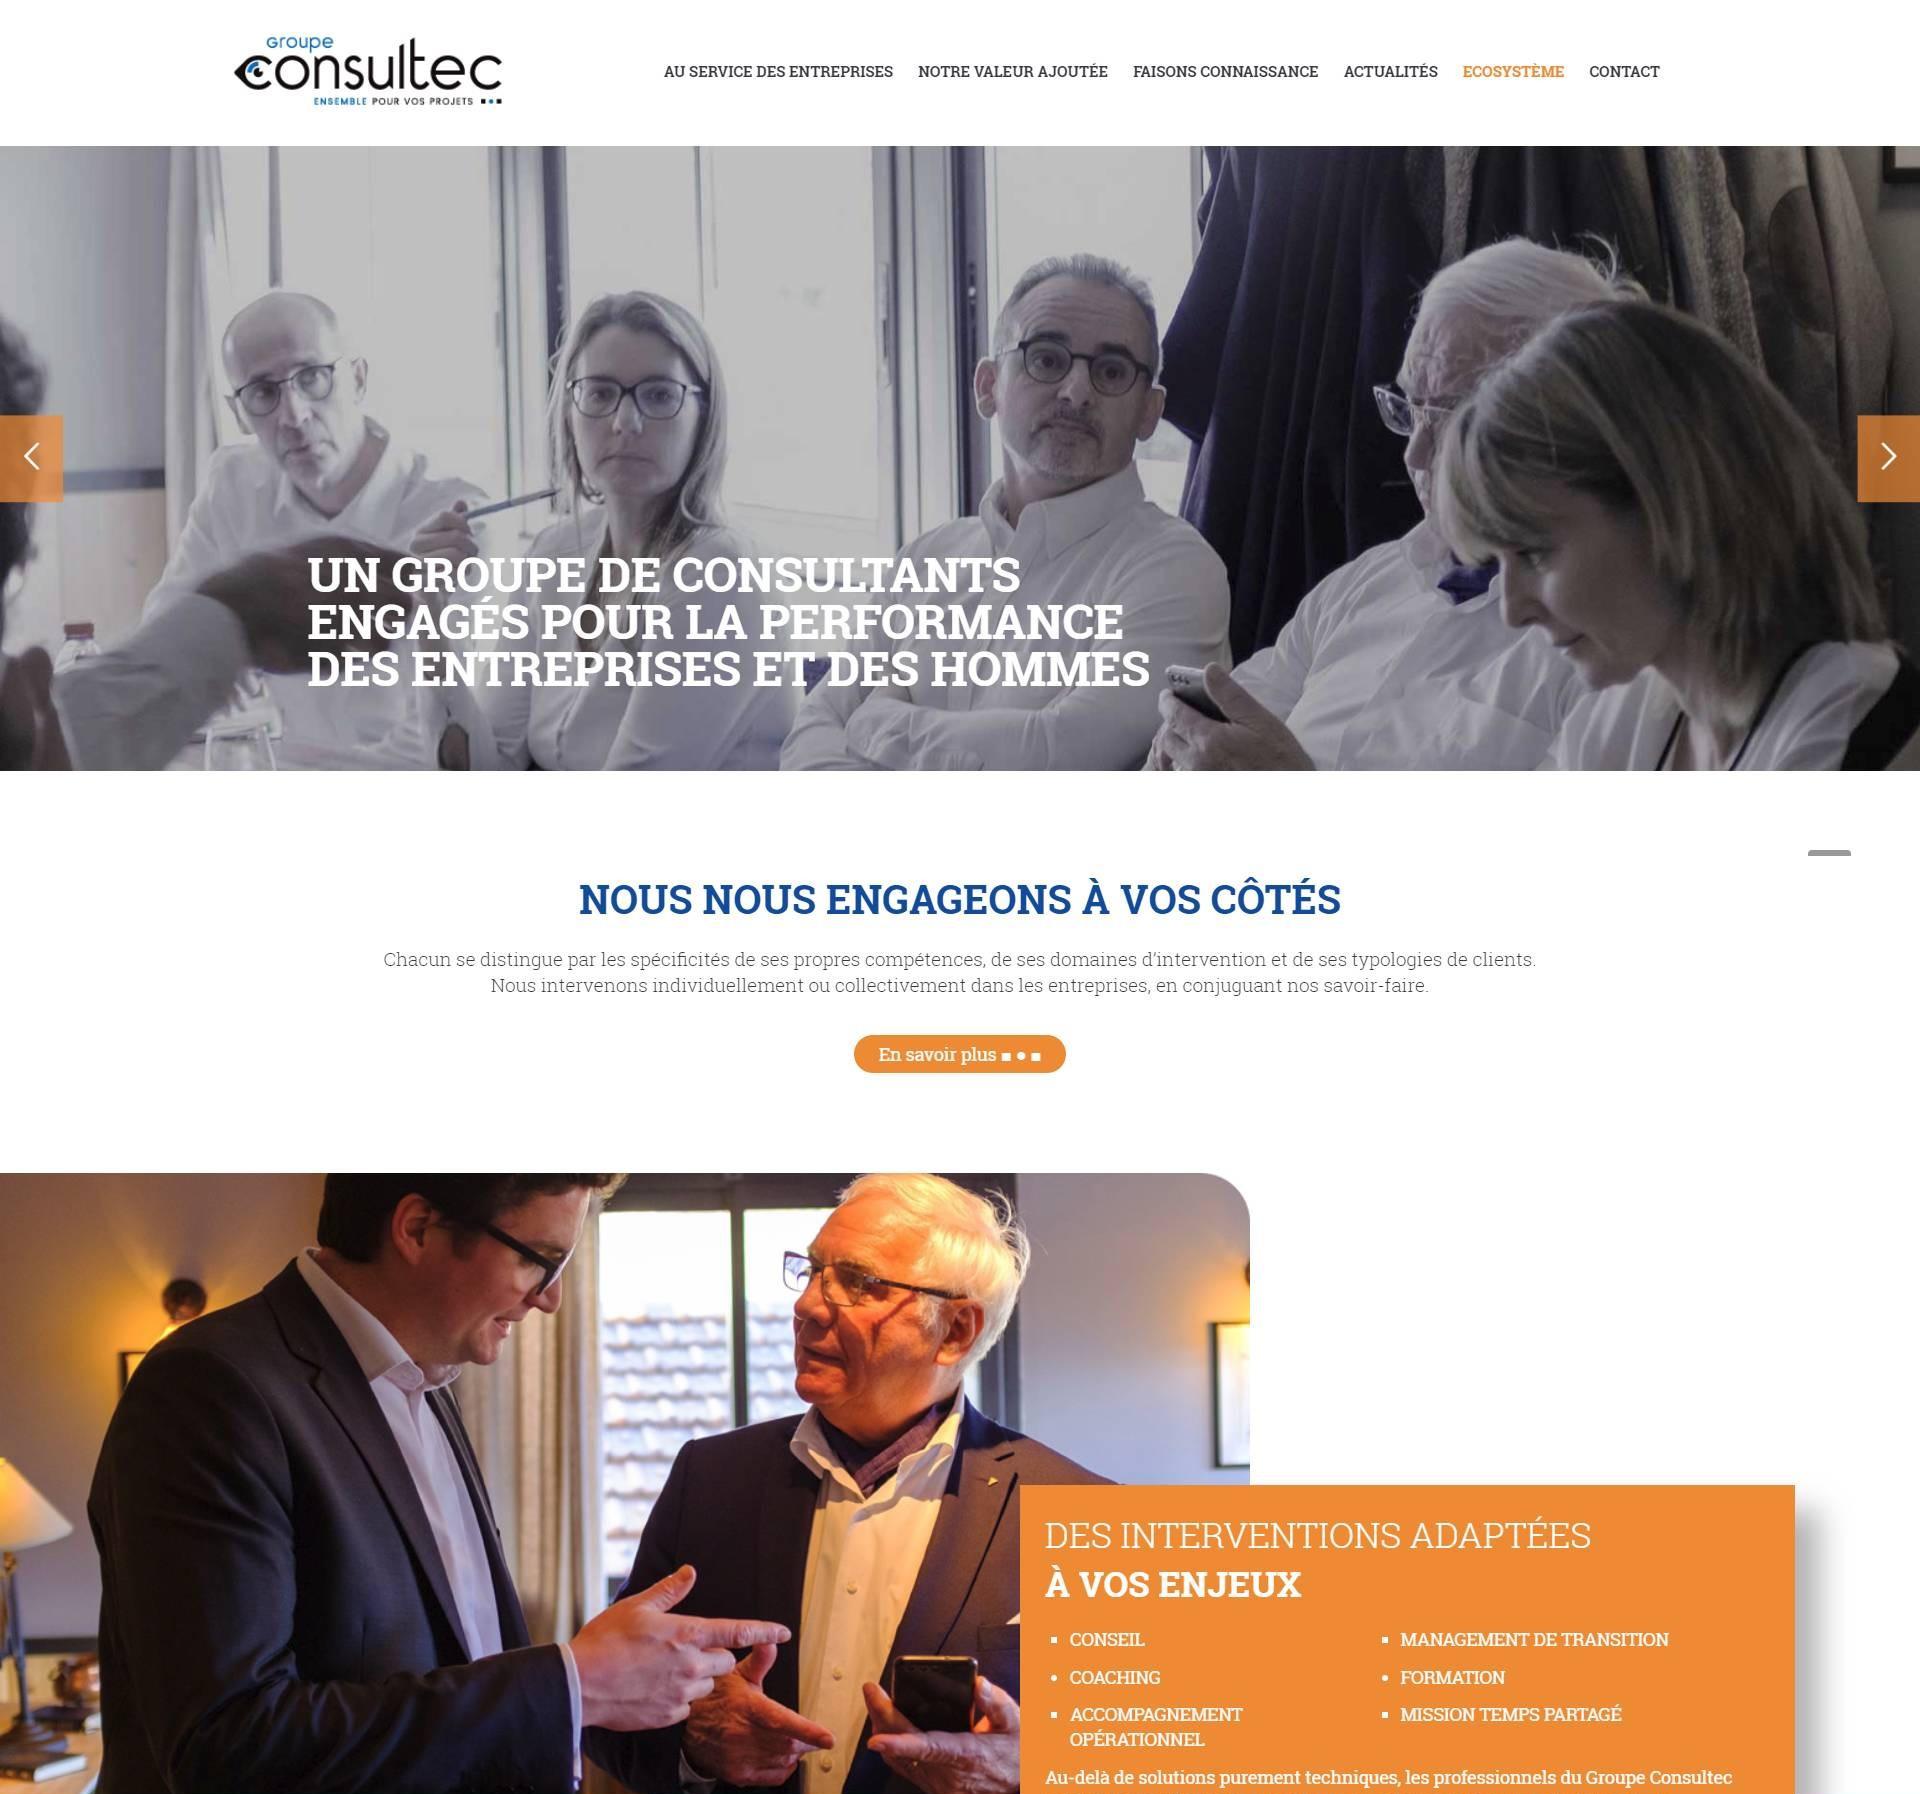 FireShot Capture 25 - Groupe Consultec – Ensemble pour vo_ - http___consultec.santehautsdefrance.fr_. 2jpg